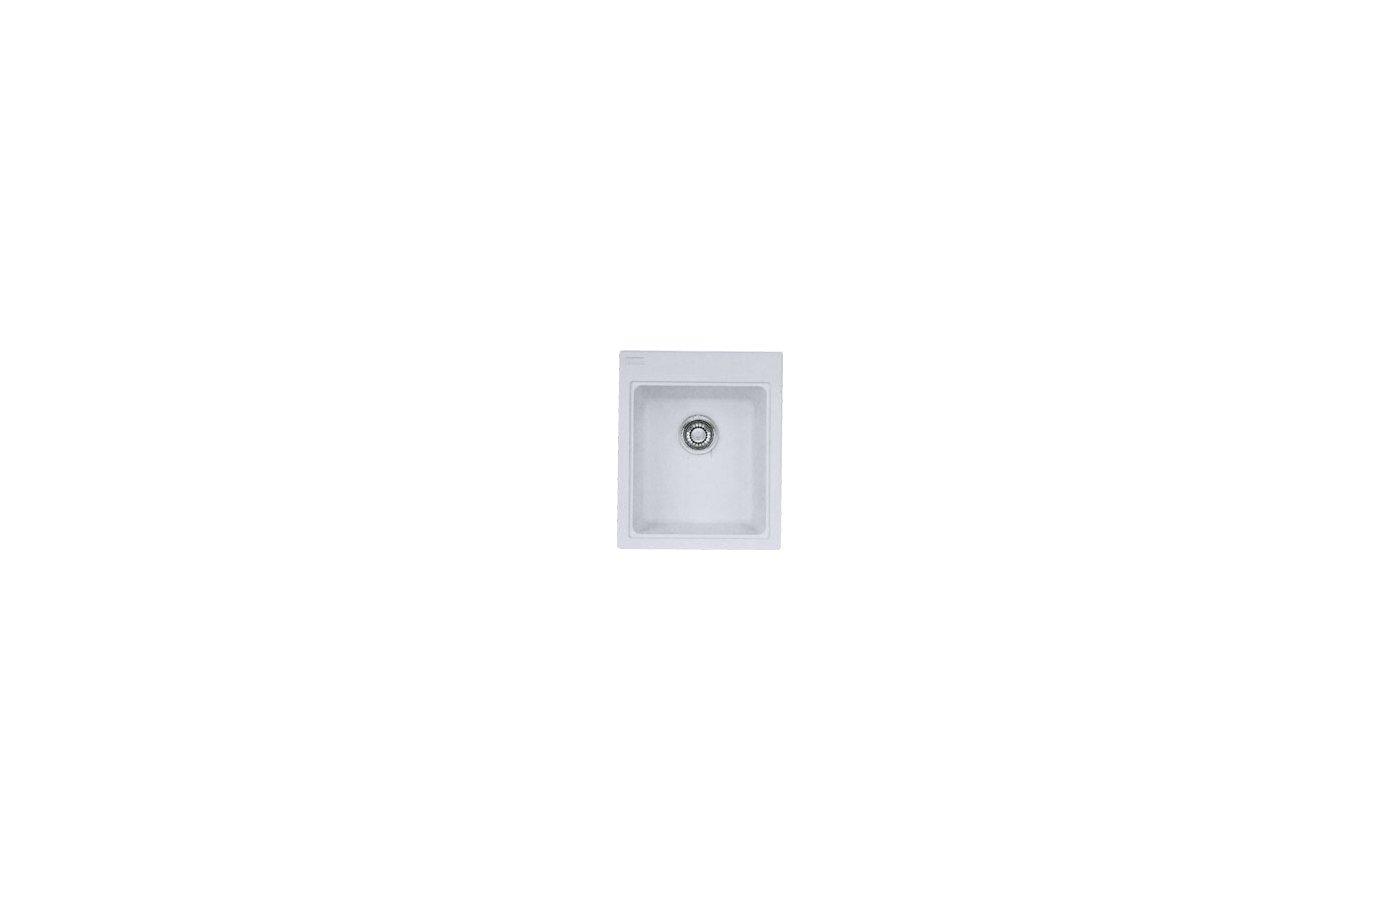 Кухонная мойка FRANKE MRG 610-42 серебро